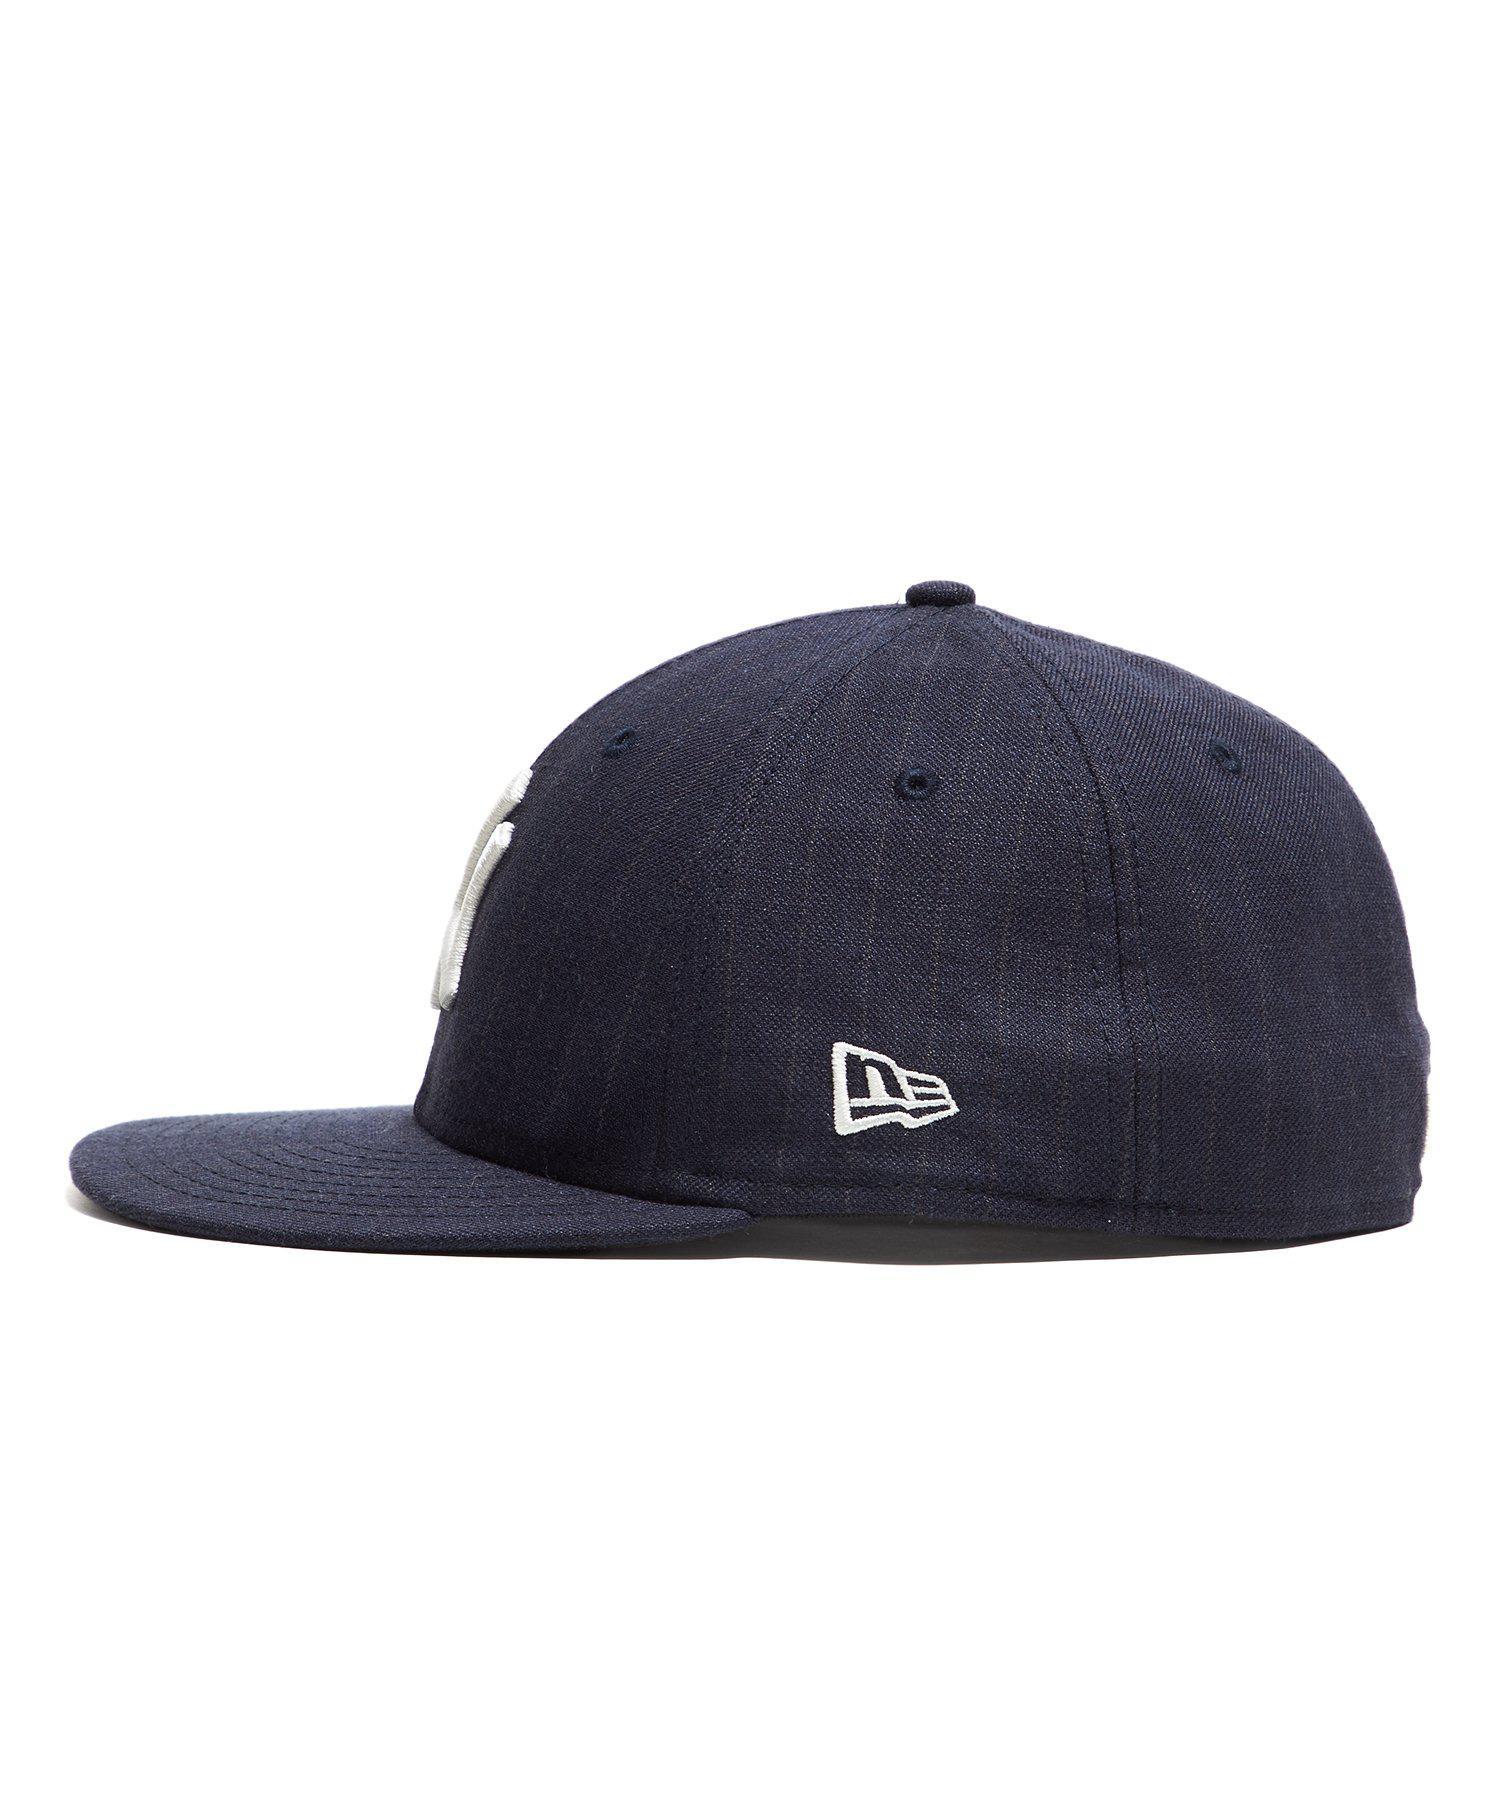 b1f798fa202 NEW ERA HATS New York Yankees Cap In Navy Pinstripe in Blue for Men - Lyst